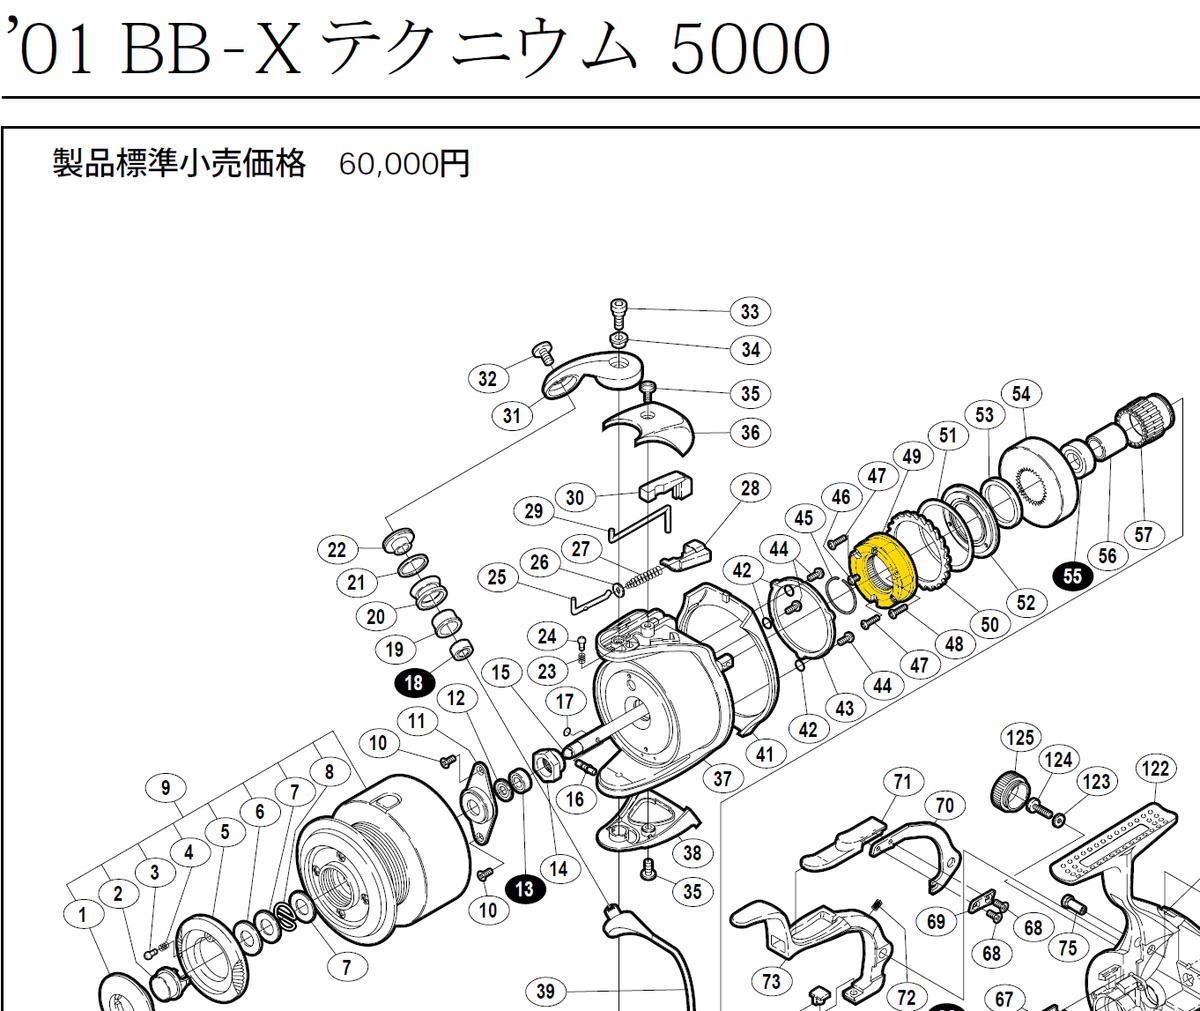 01BB-X